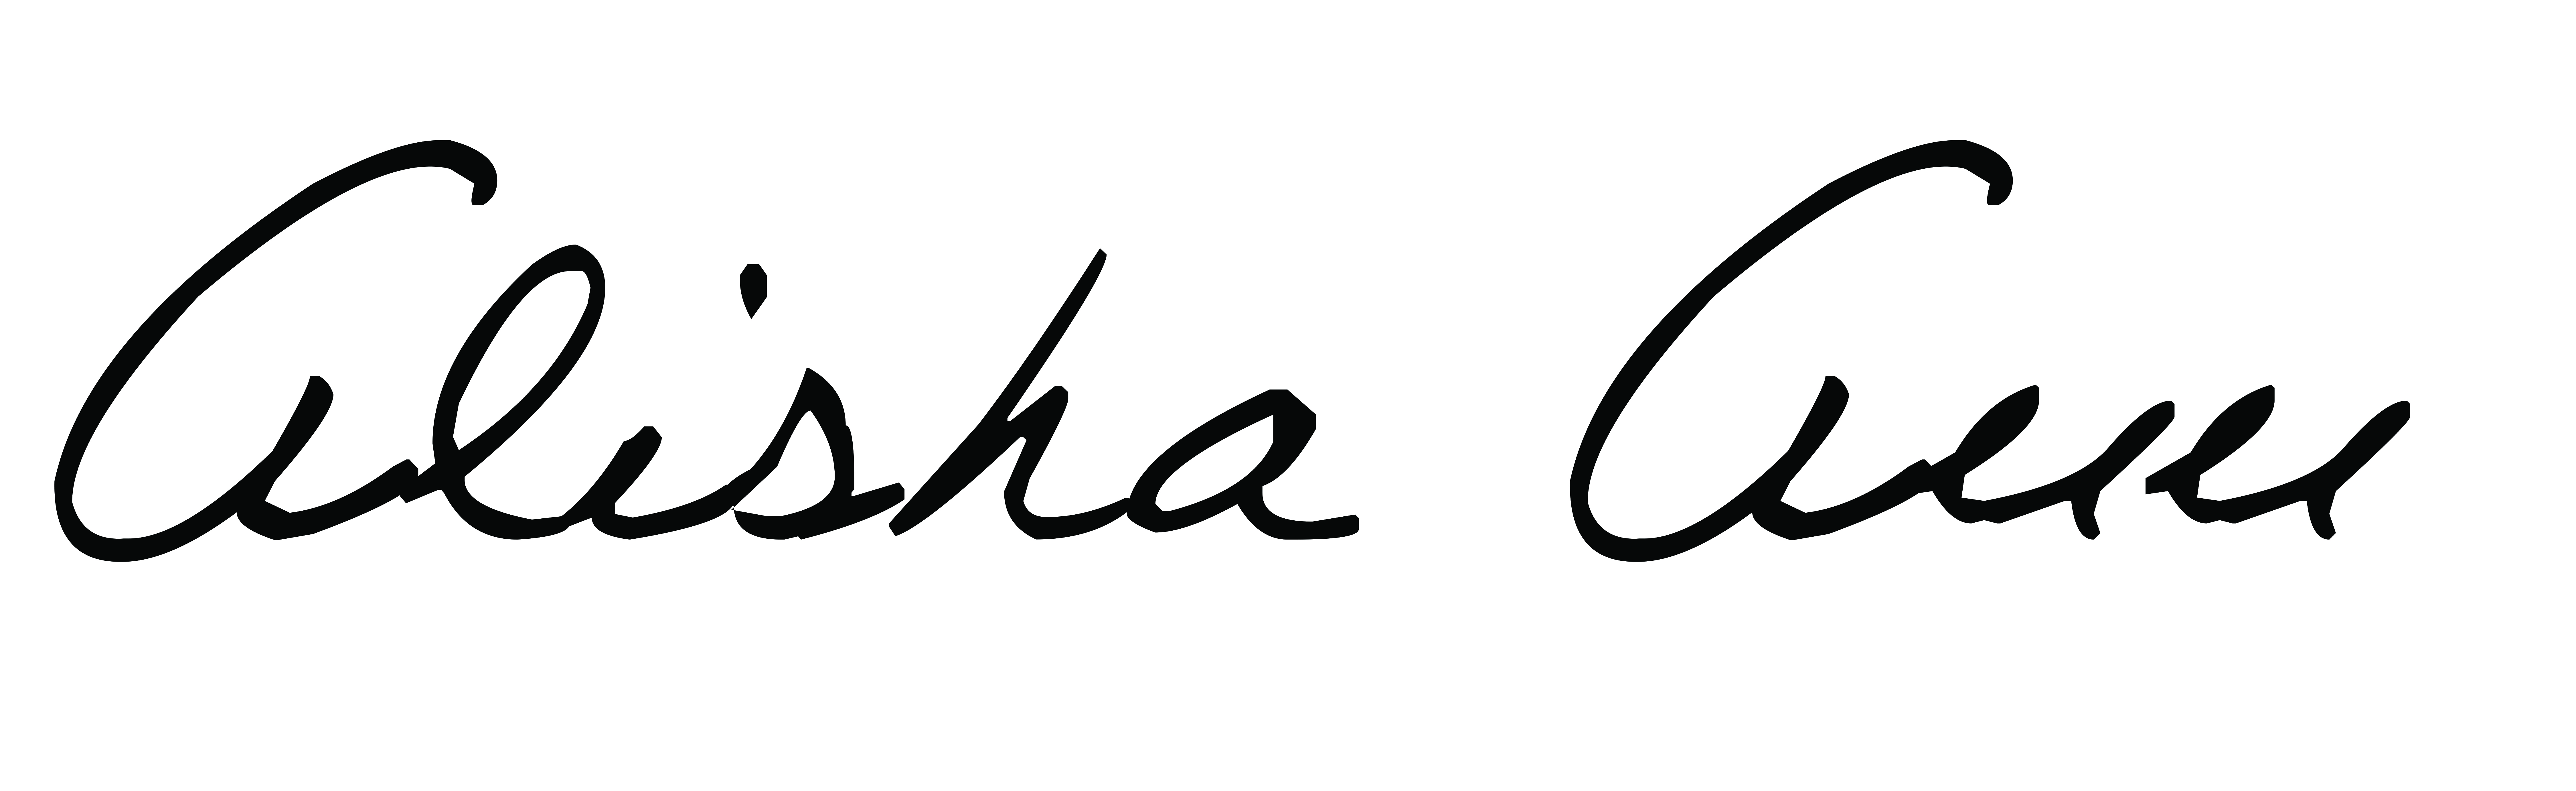 Alisha Boguslowski's Signature